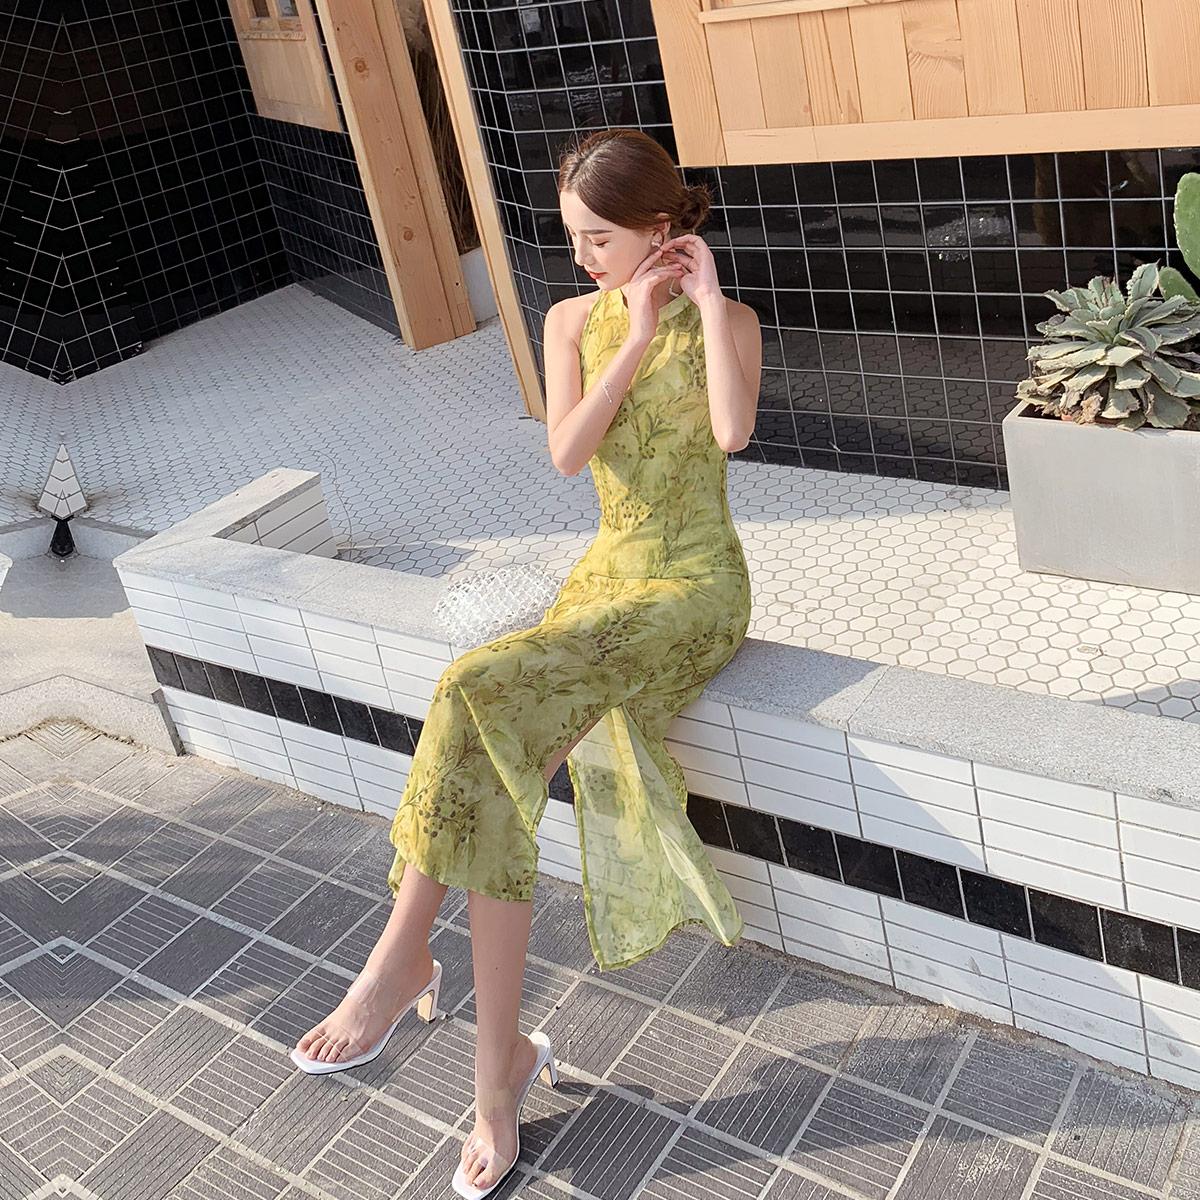 jkjs新式旗袍年轻款中国风夏少女改时尚民国风改良女装日常复古连衣裙JK9046334